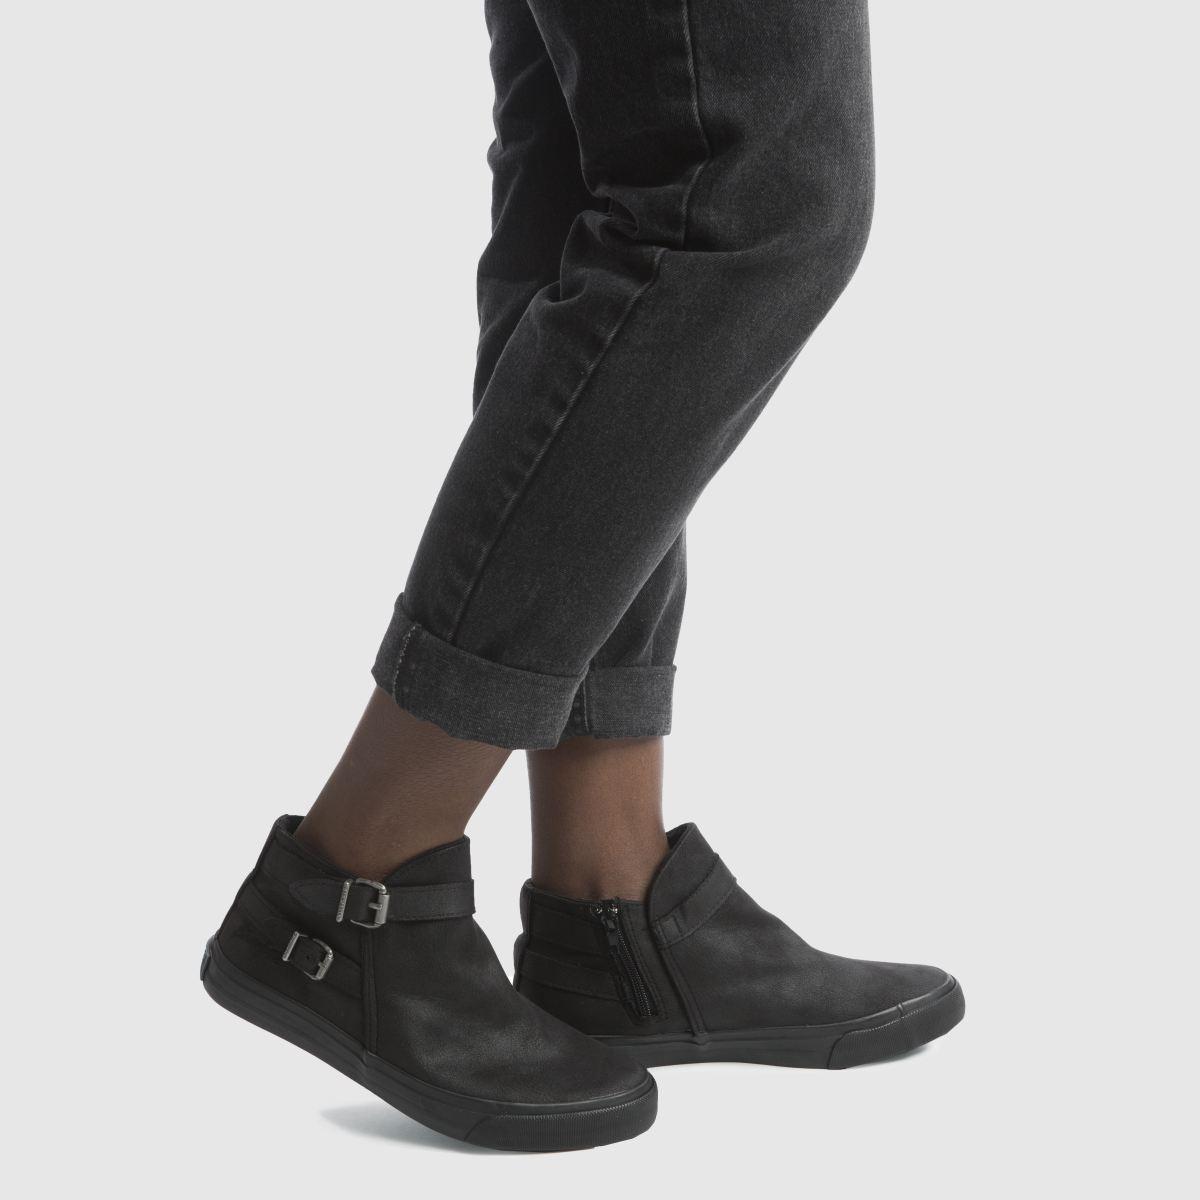 Damen | Schwarz blowfish Monroe Boots | Damen schuh Gute Qualität beliebte Schuhe ca5ee8